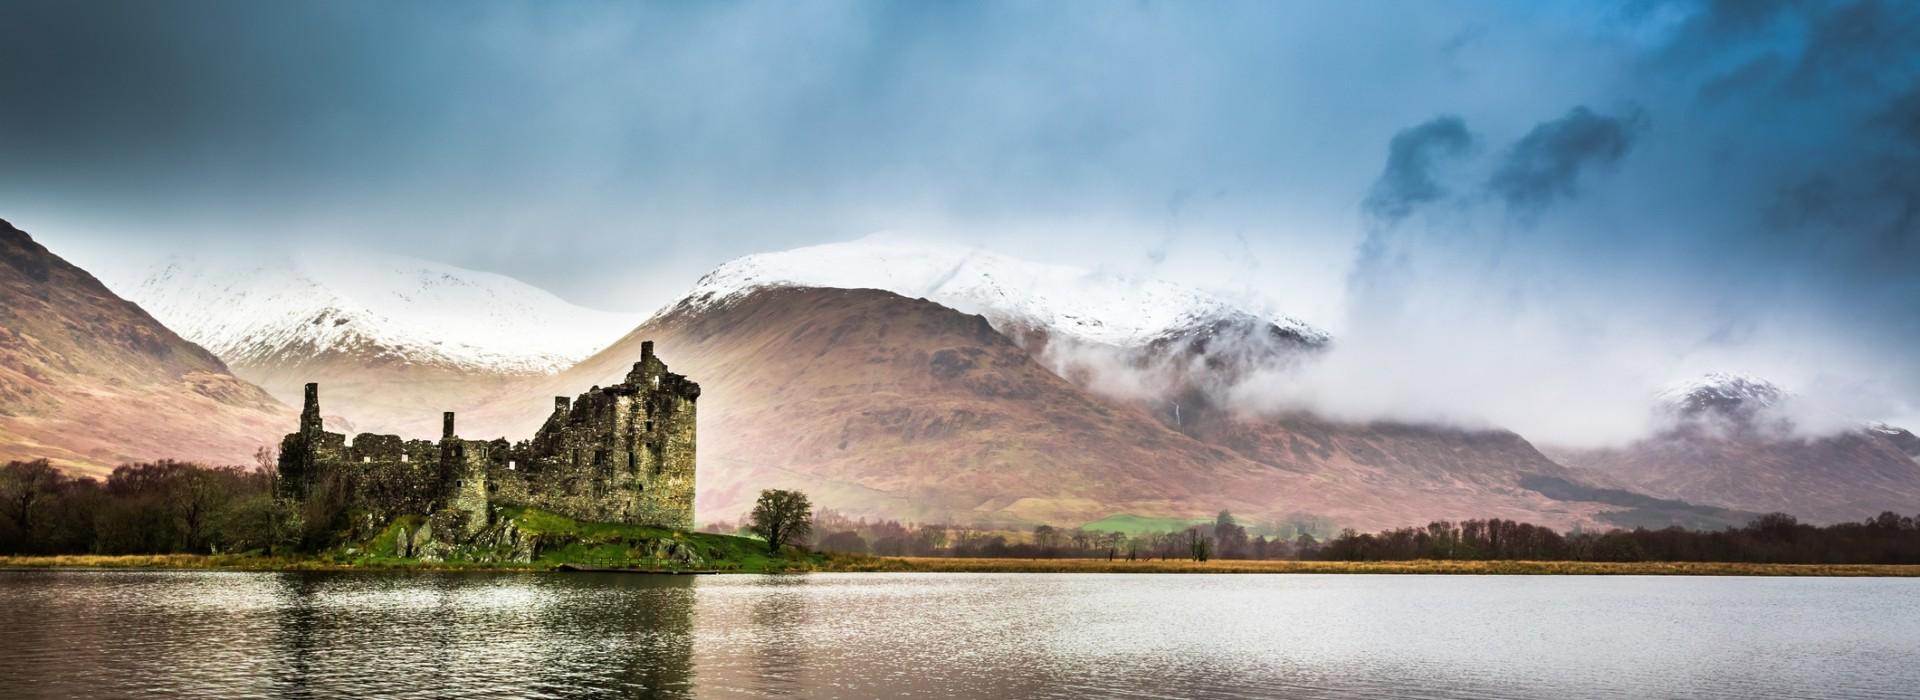 travel scotland highlands